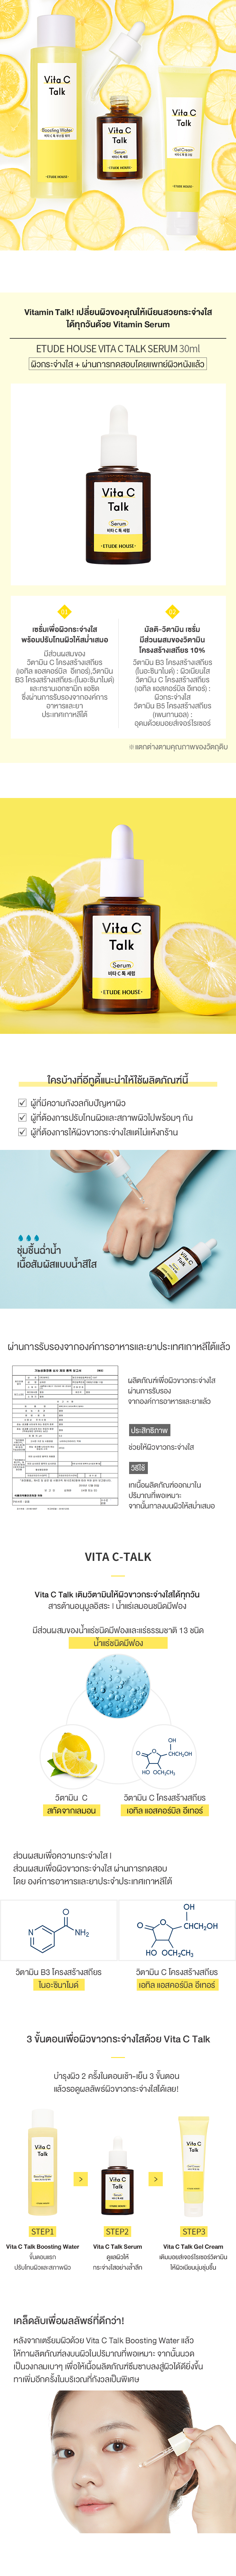 TH1_[Vita C] Serum